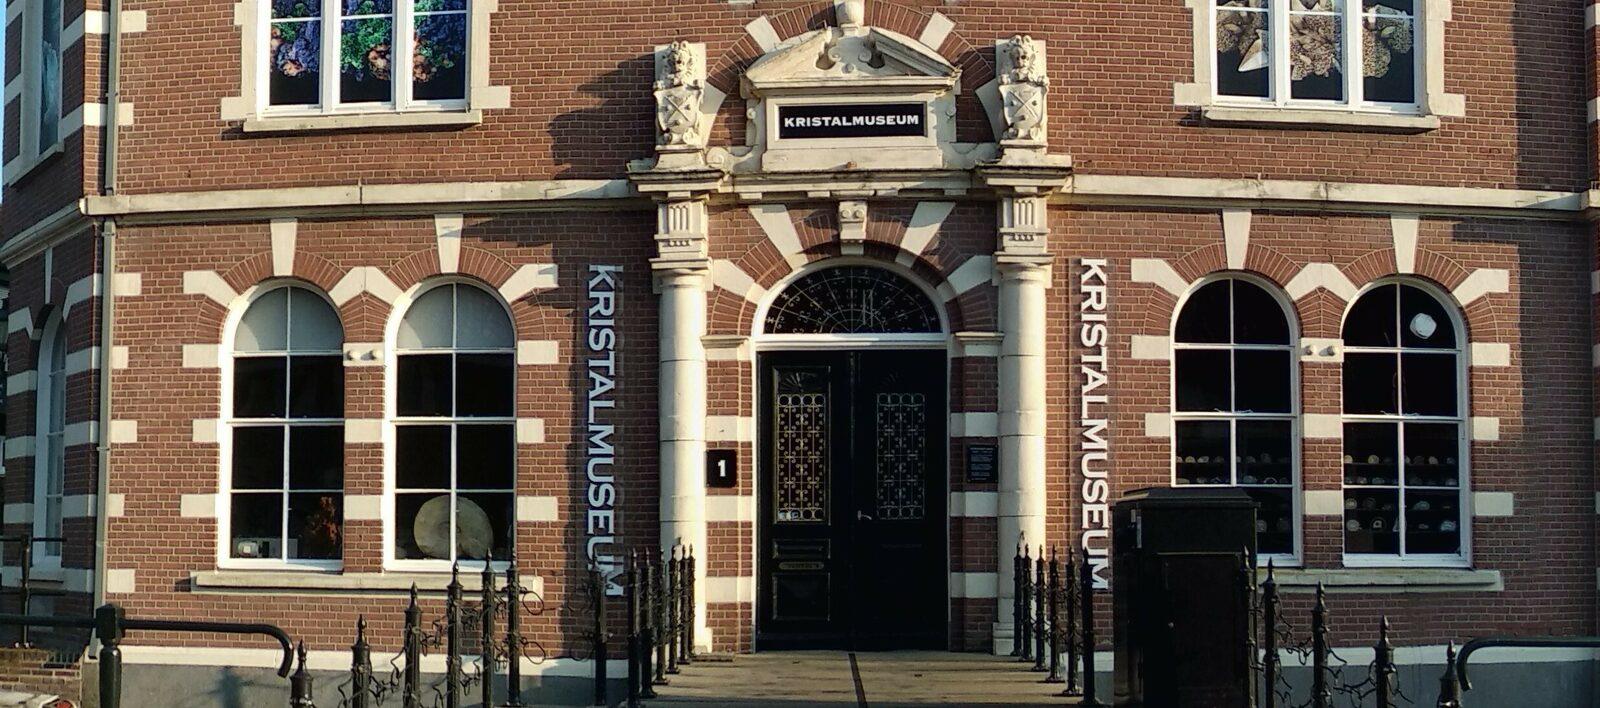 Kristalmuseum Borculo